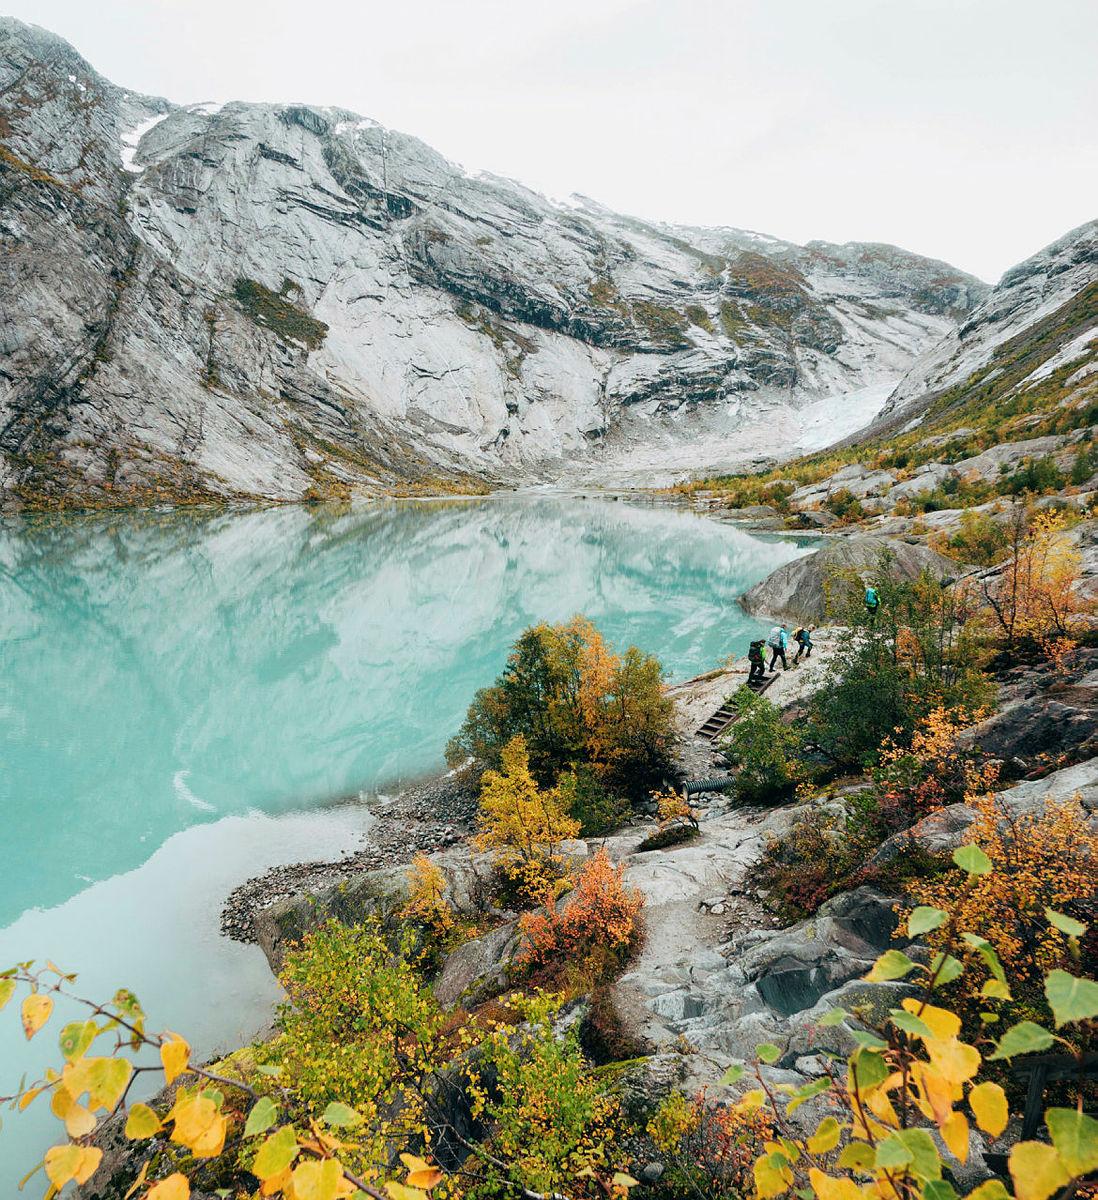 Fire turgåere på vei inn til Nigardsbreen i Jostedalen, en brearm av Jostedalsbreen. Finalist i fotokonkurransen høsten 2018.